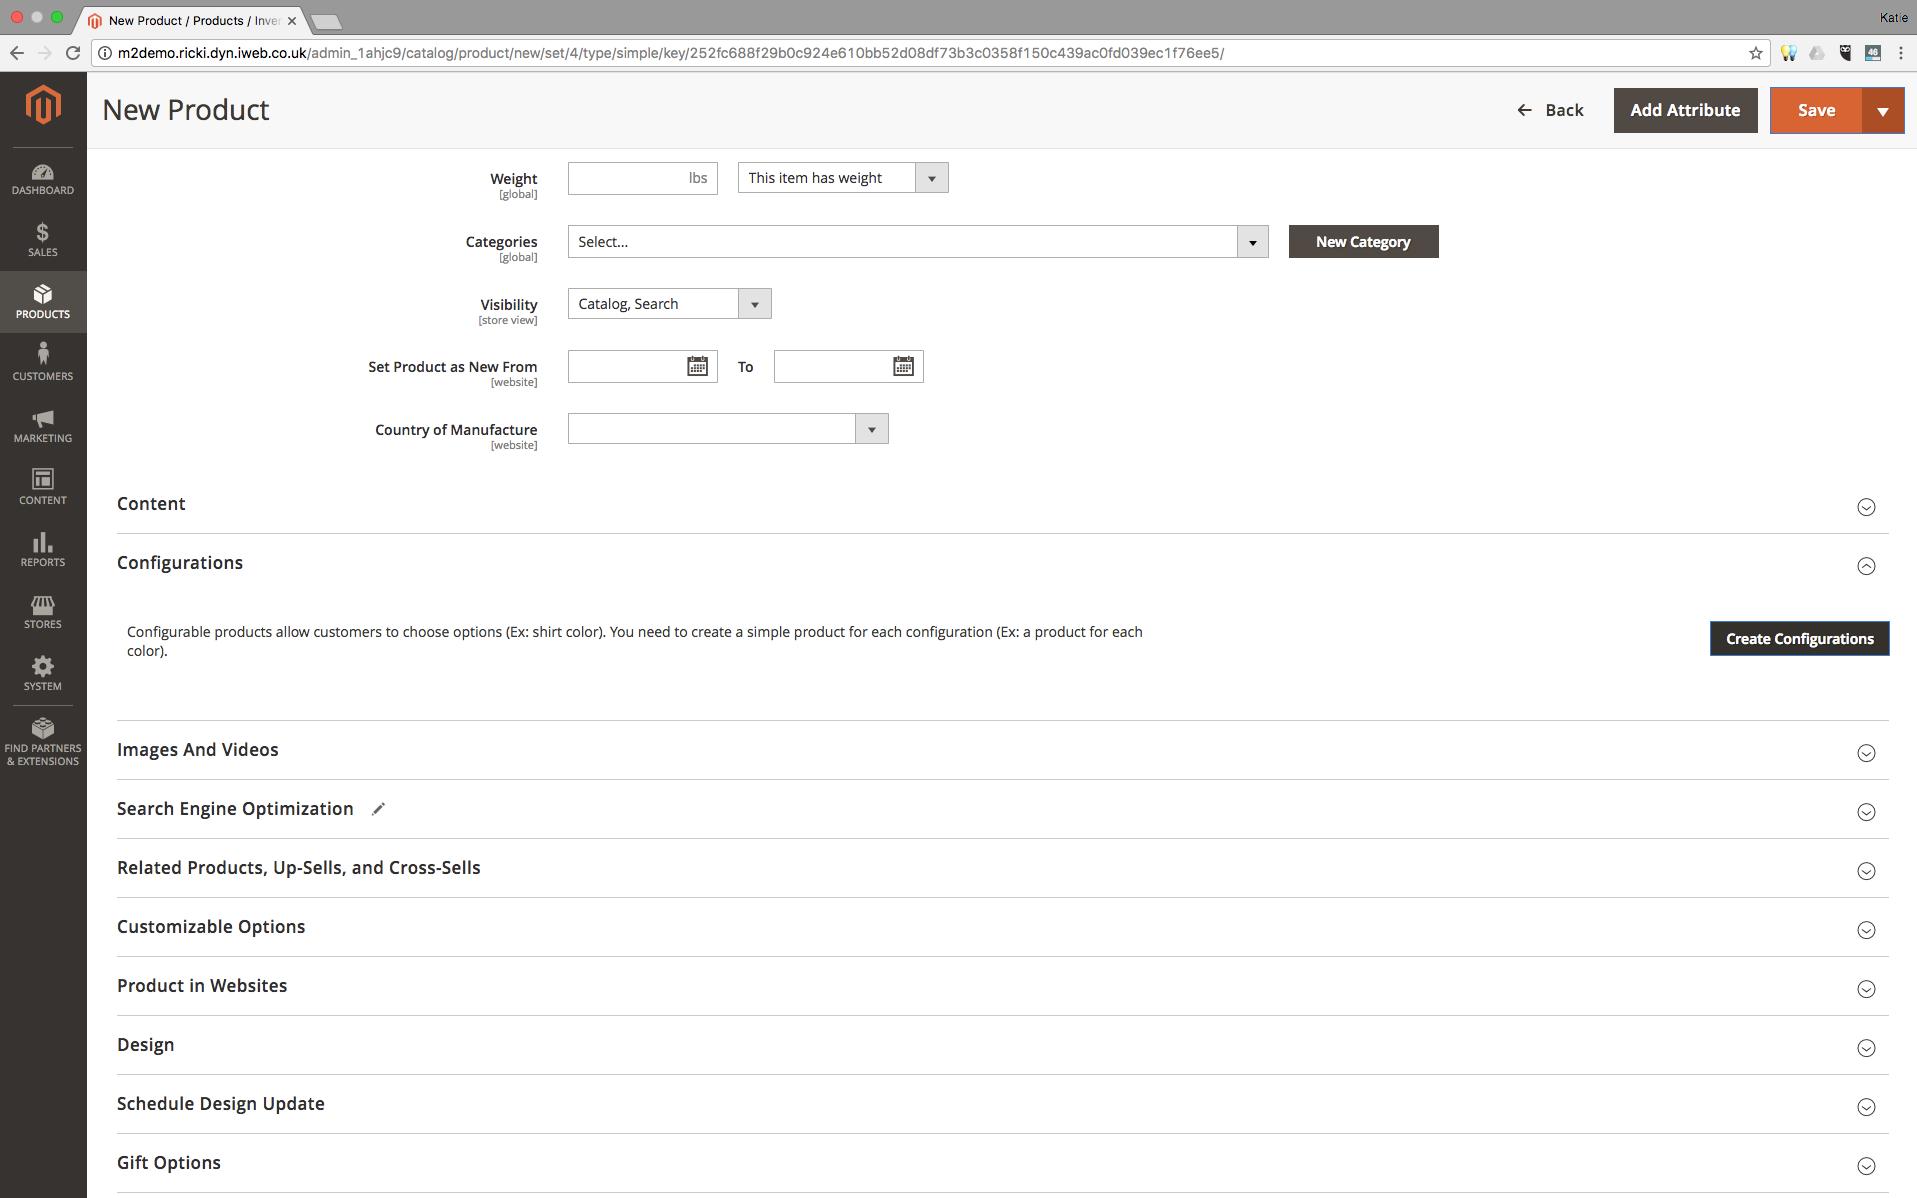 Magento 2 V Magento 1 | New Product | iWeb